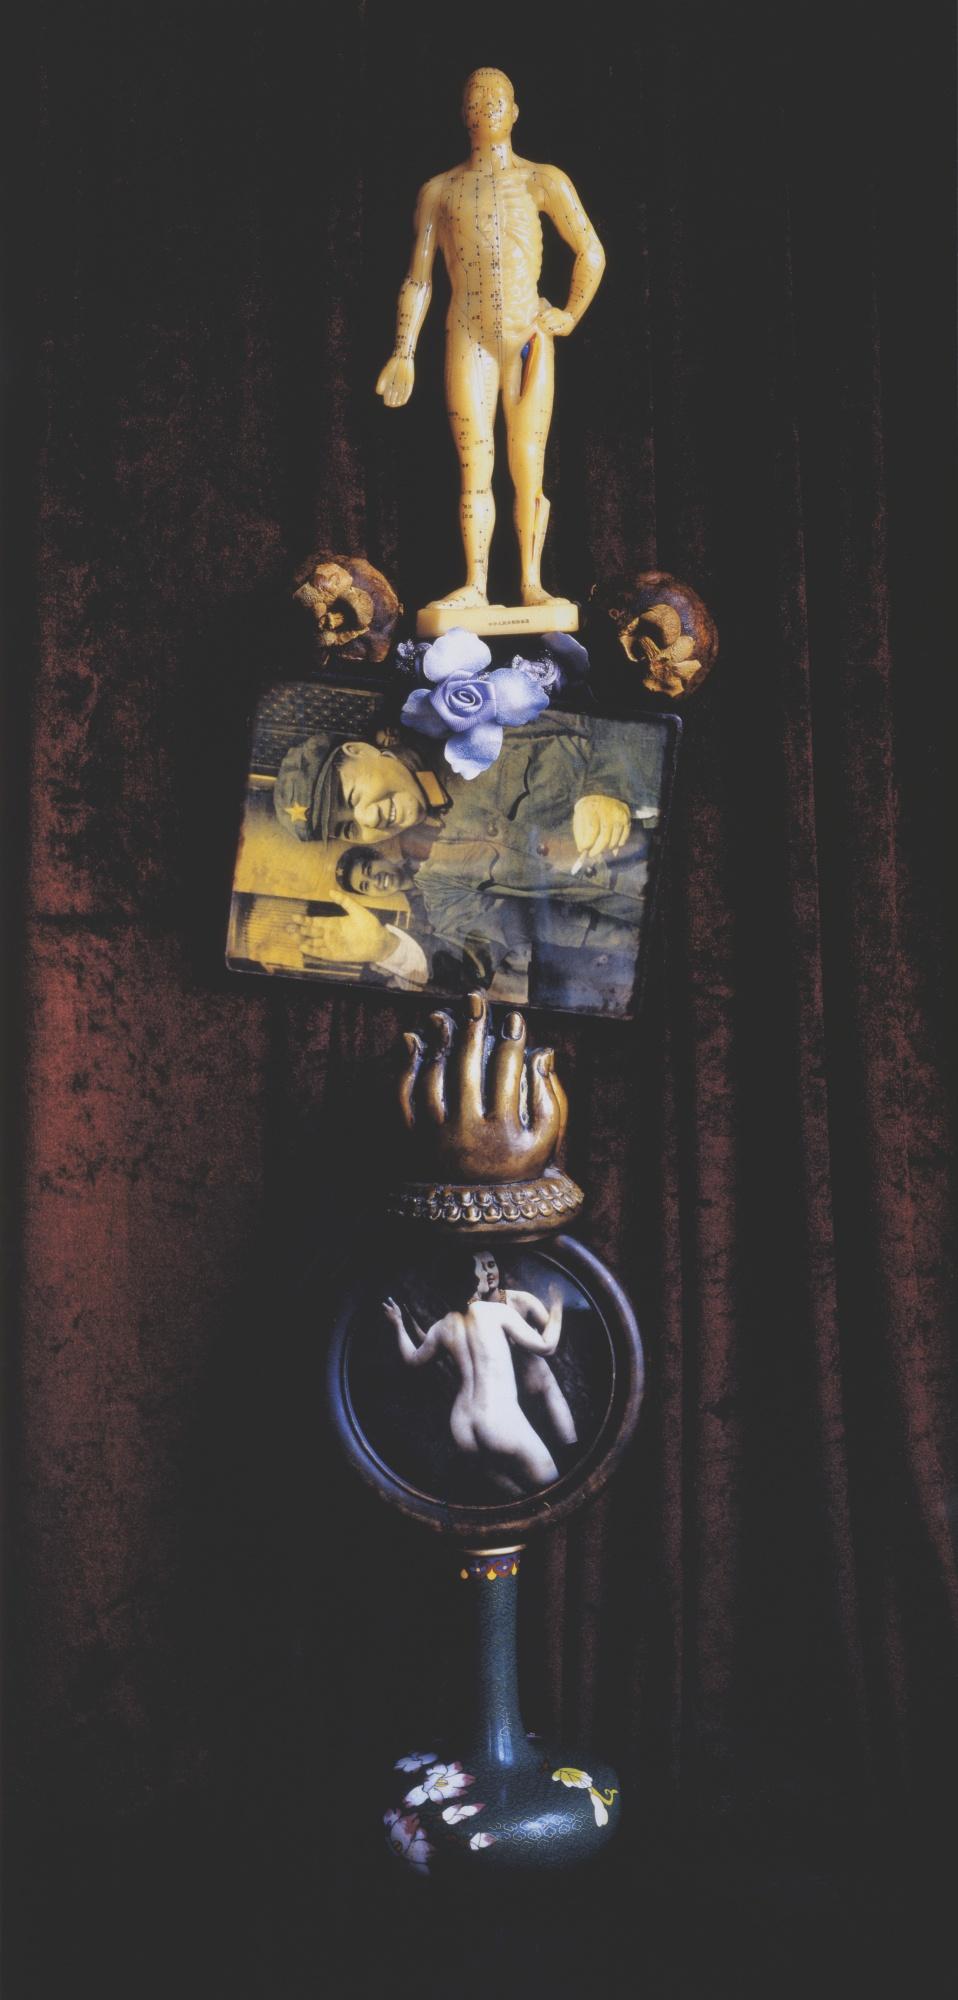 Han Lei-Pagoda Series No. 2-2005